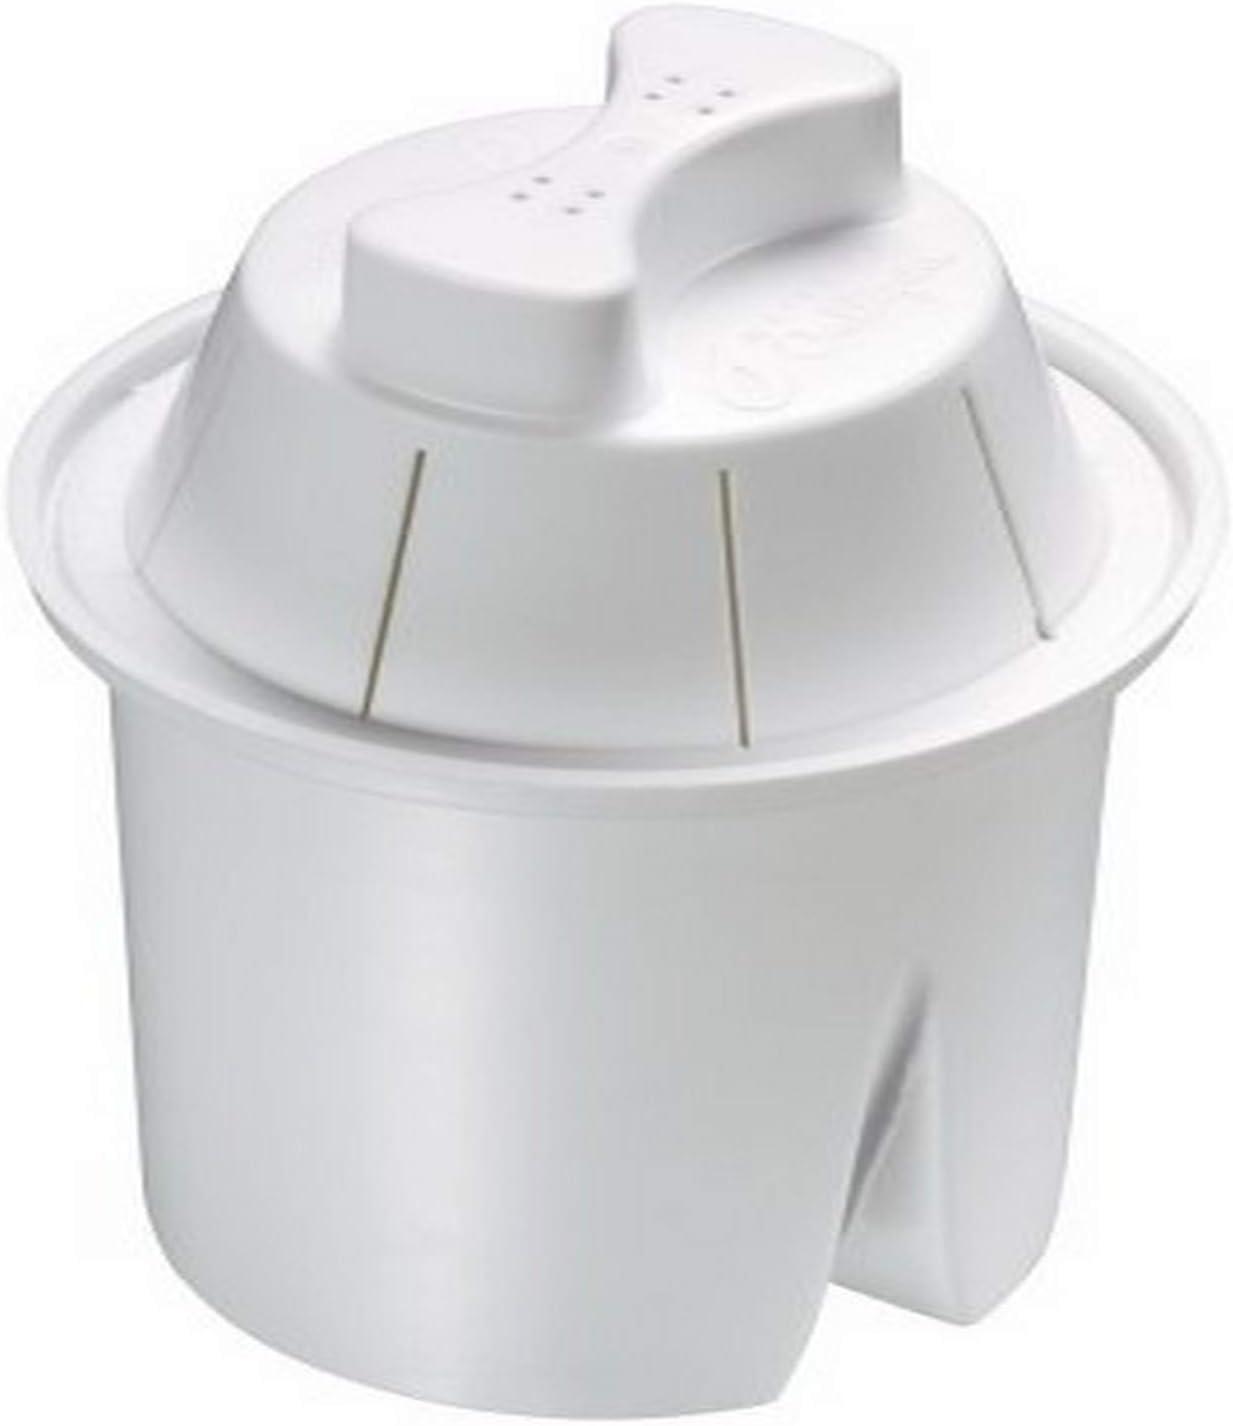 Culligan Water San Jose Mall Pitcher Ranking TOP19 Cartridge Filter Replacement